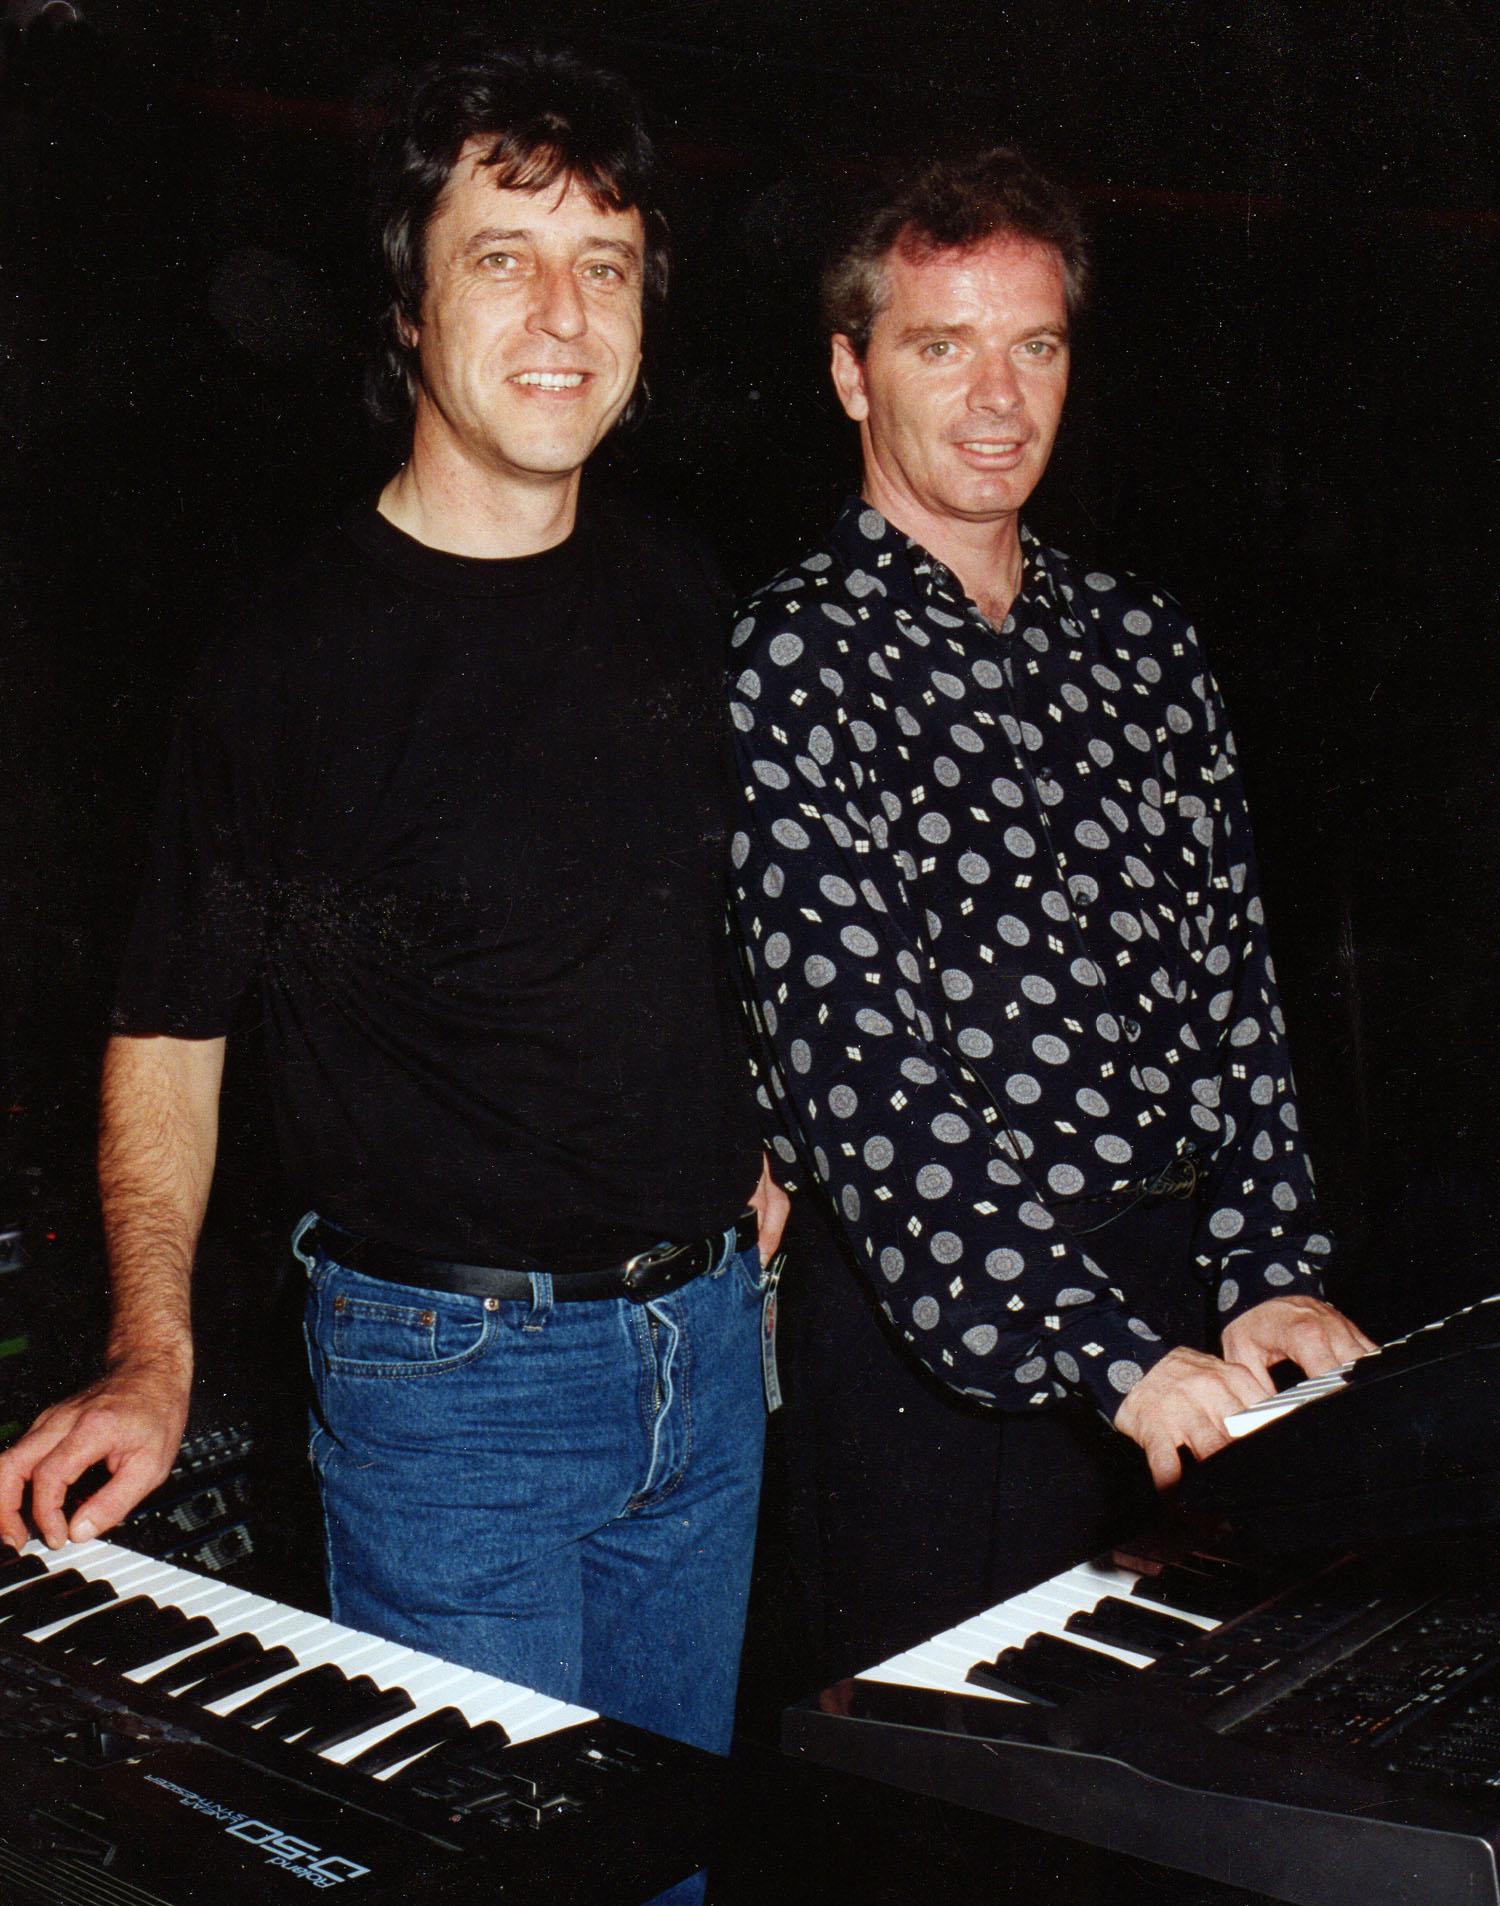 David Wright & Jonn Serrie, The London Planetarium, October 1995